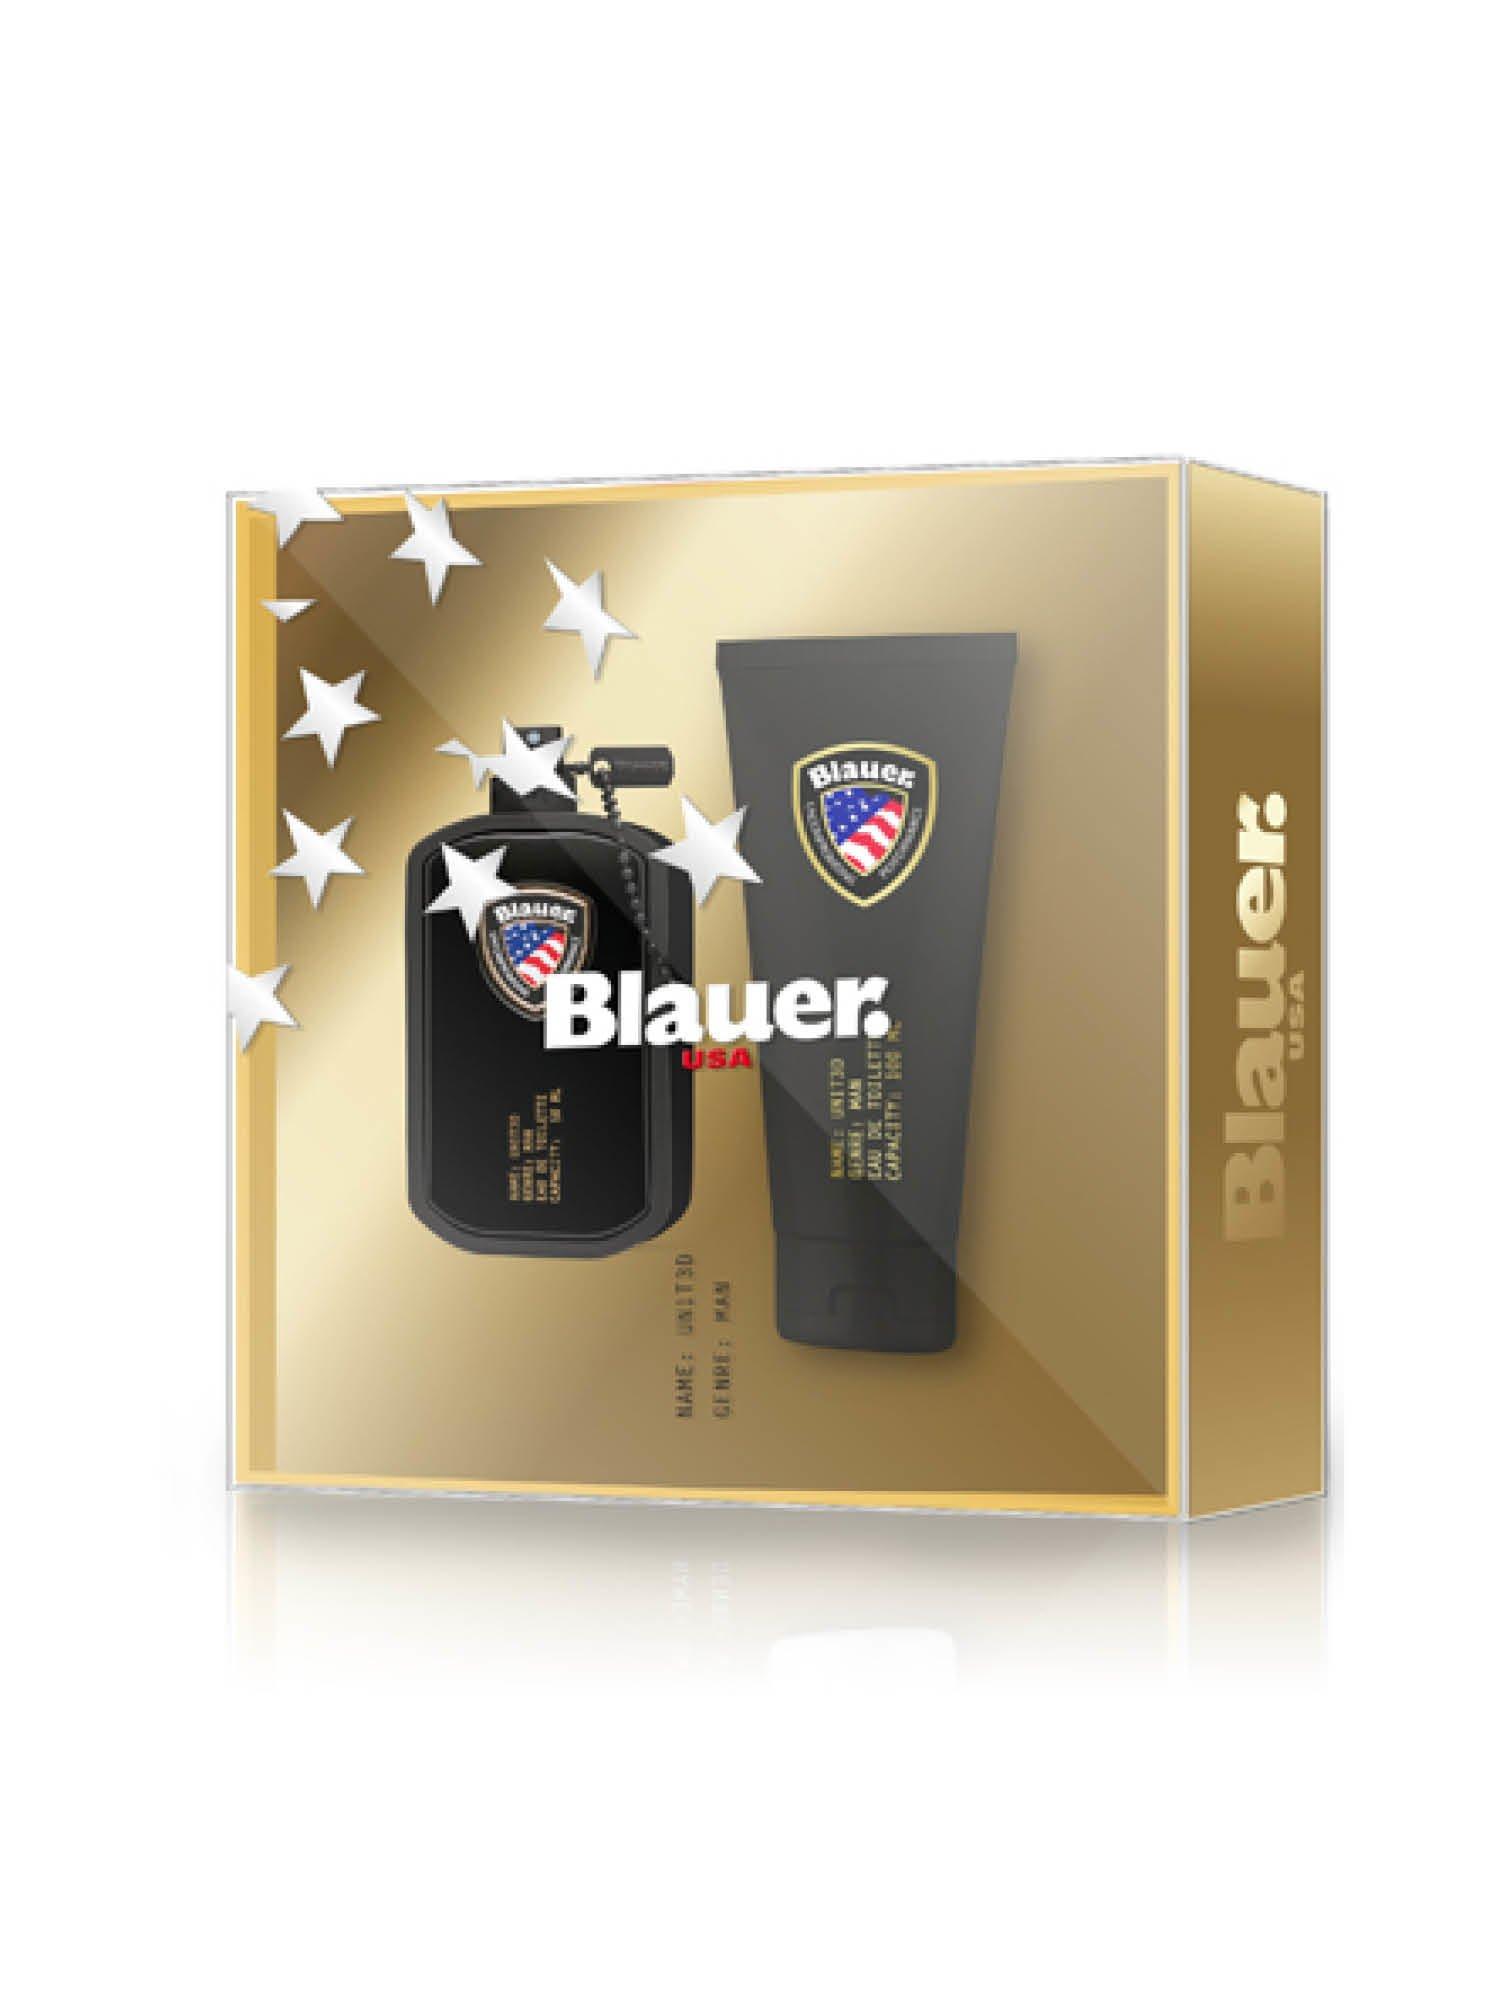 Blauer - BLAUER UN1T3D COFFRET FOR MAN - gold - Blauer